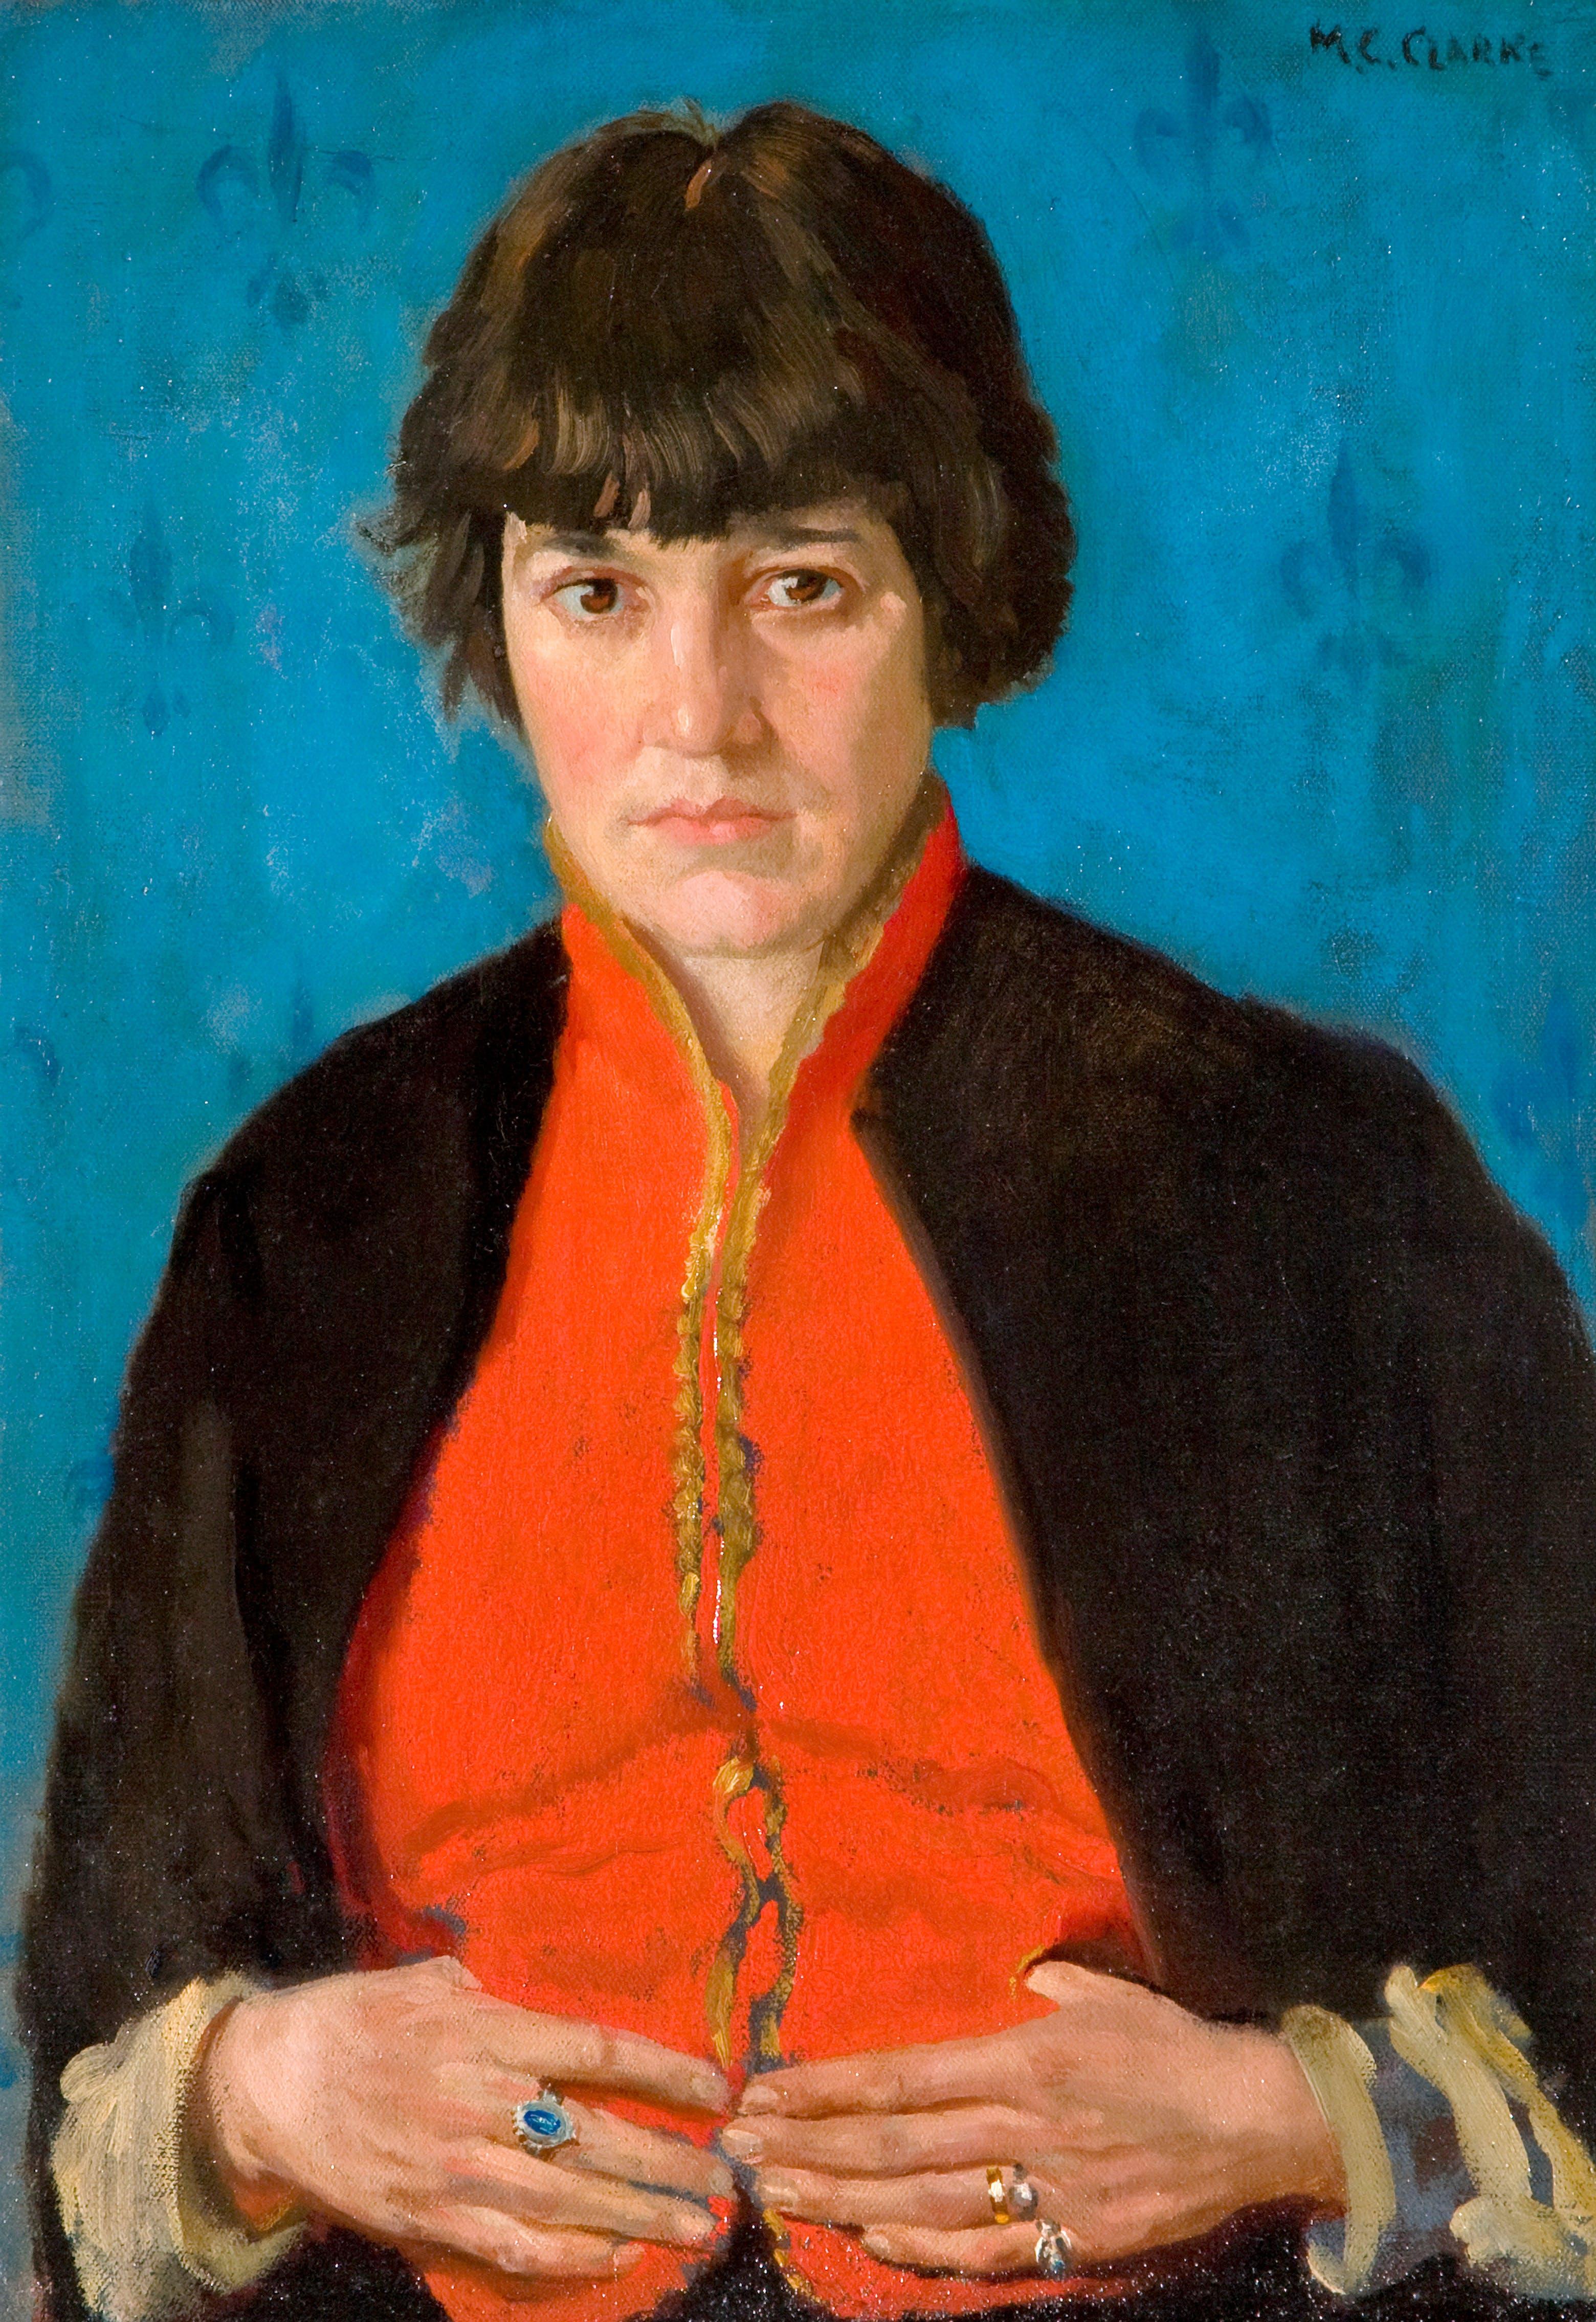 Margaret Clarke, Robin Redbreast, c. 1915(© The Estate of Margaret Clarke, Collection Ulster Museum)